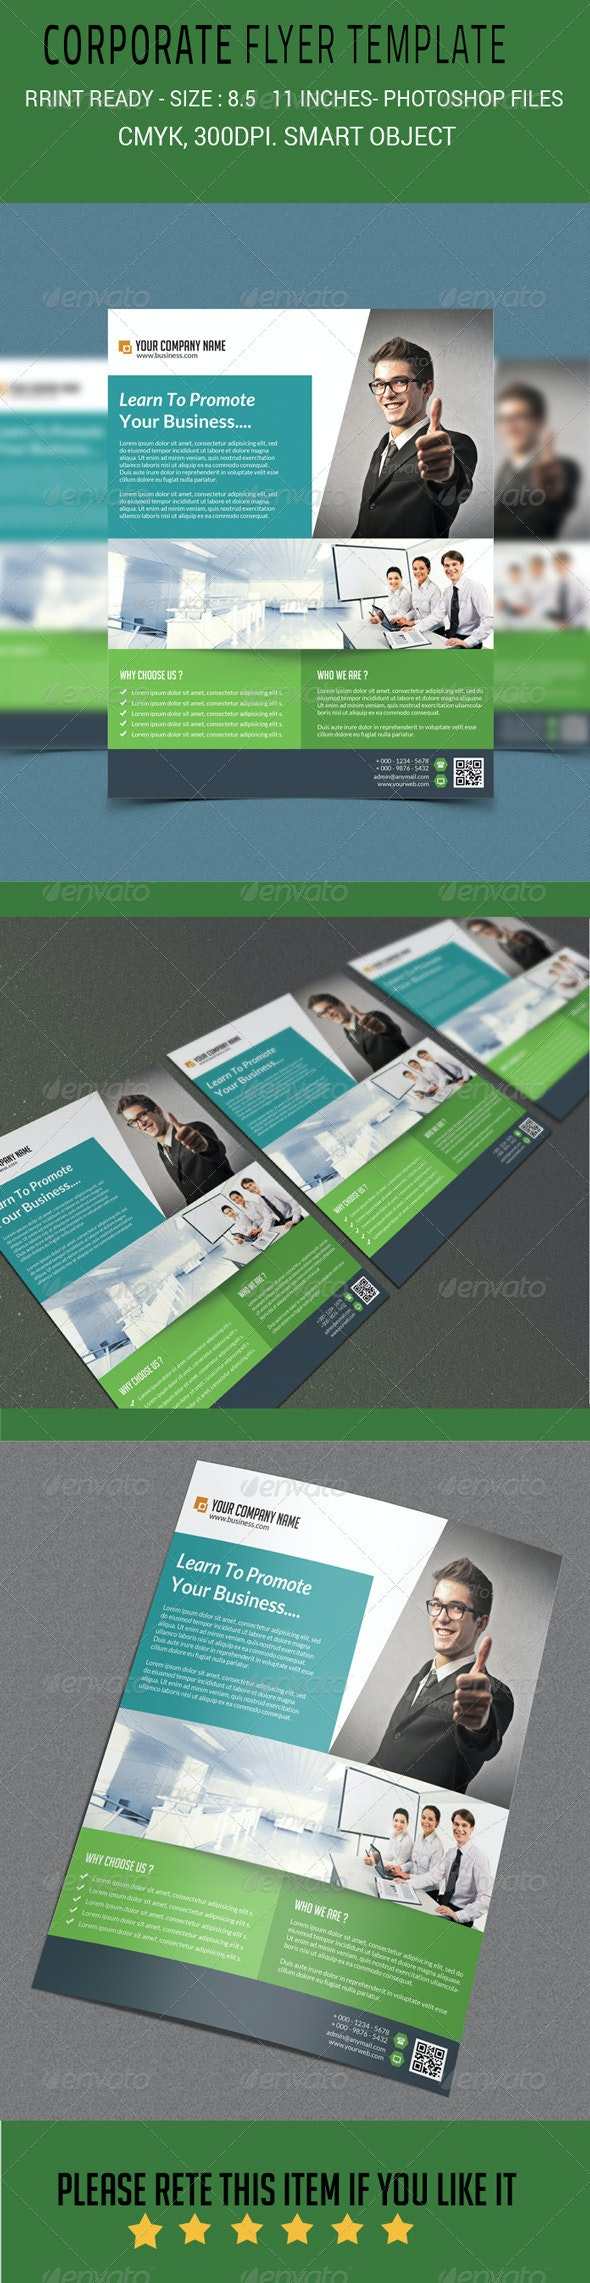 Creative Corporate Business Flyer Template - Corporate Flyers